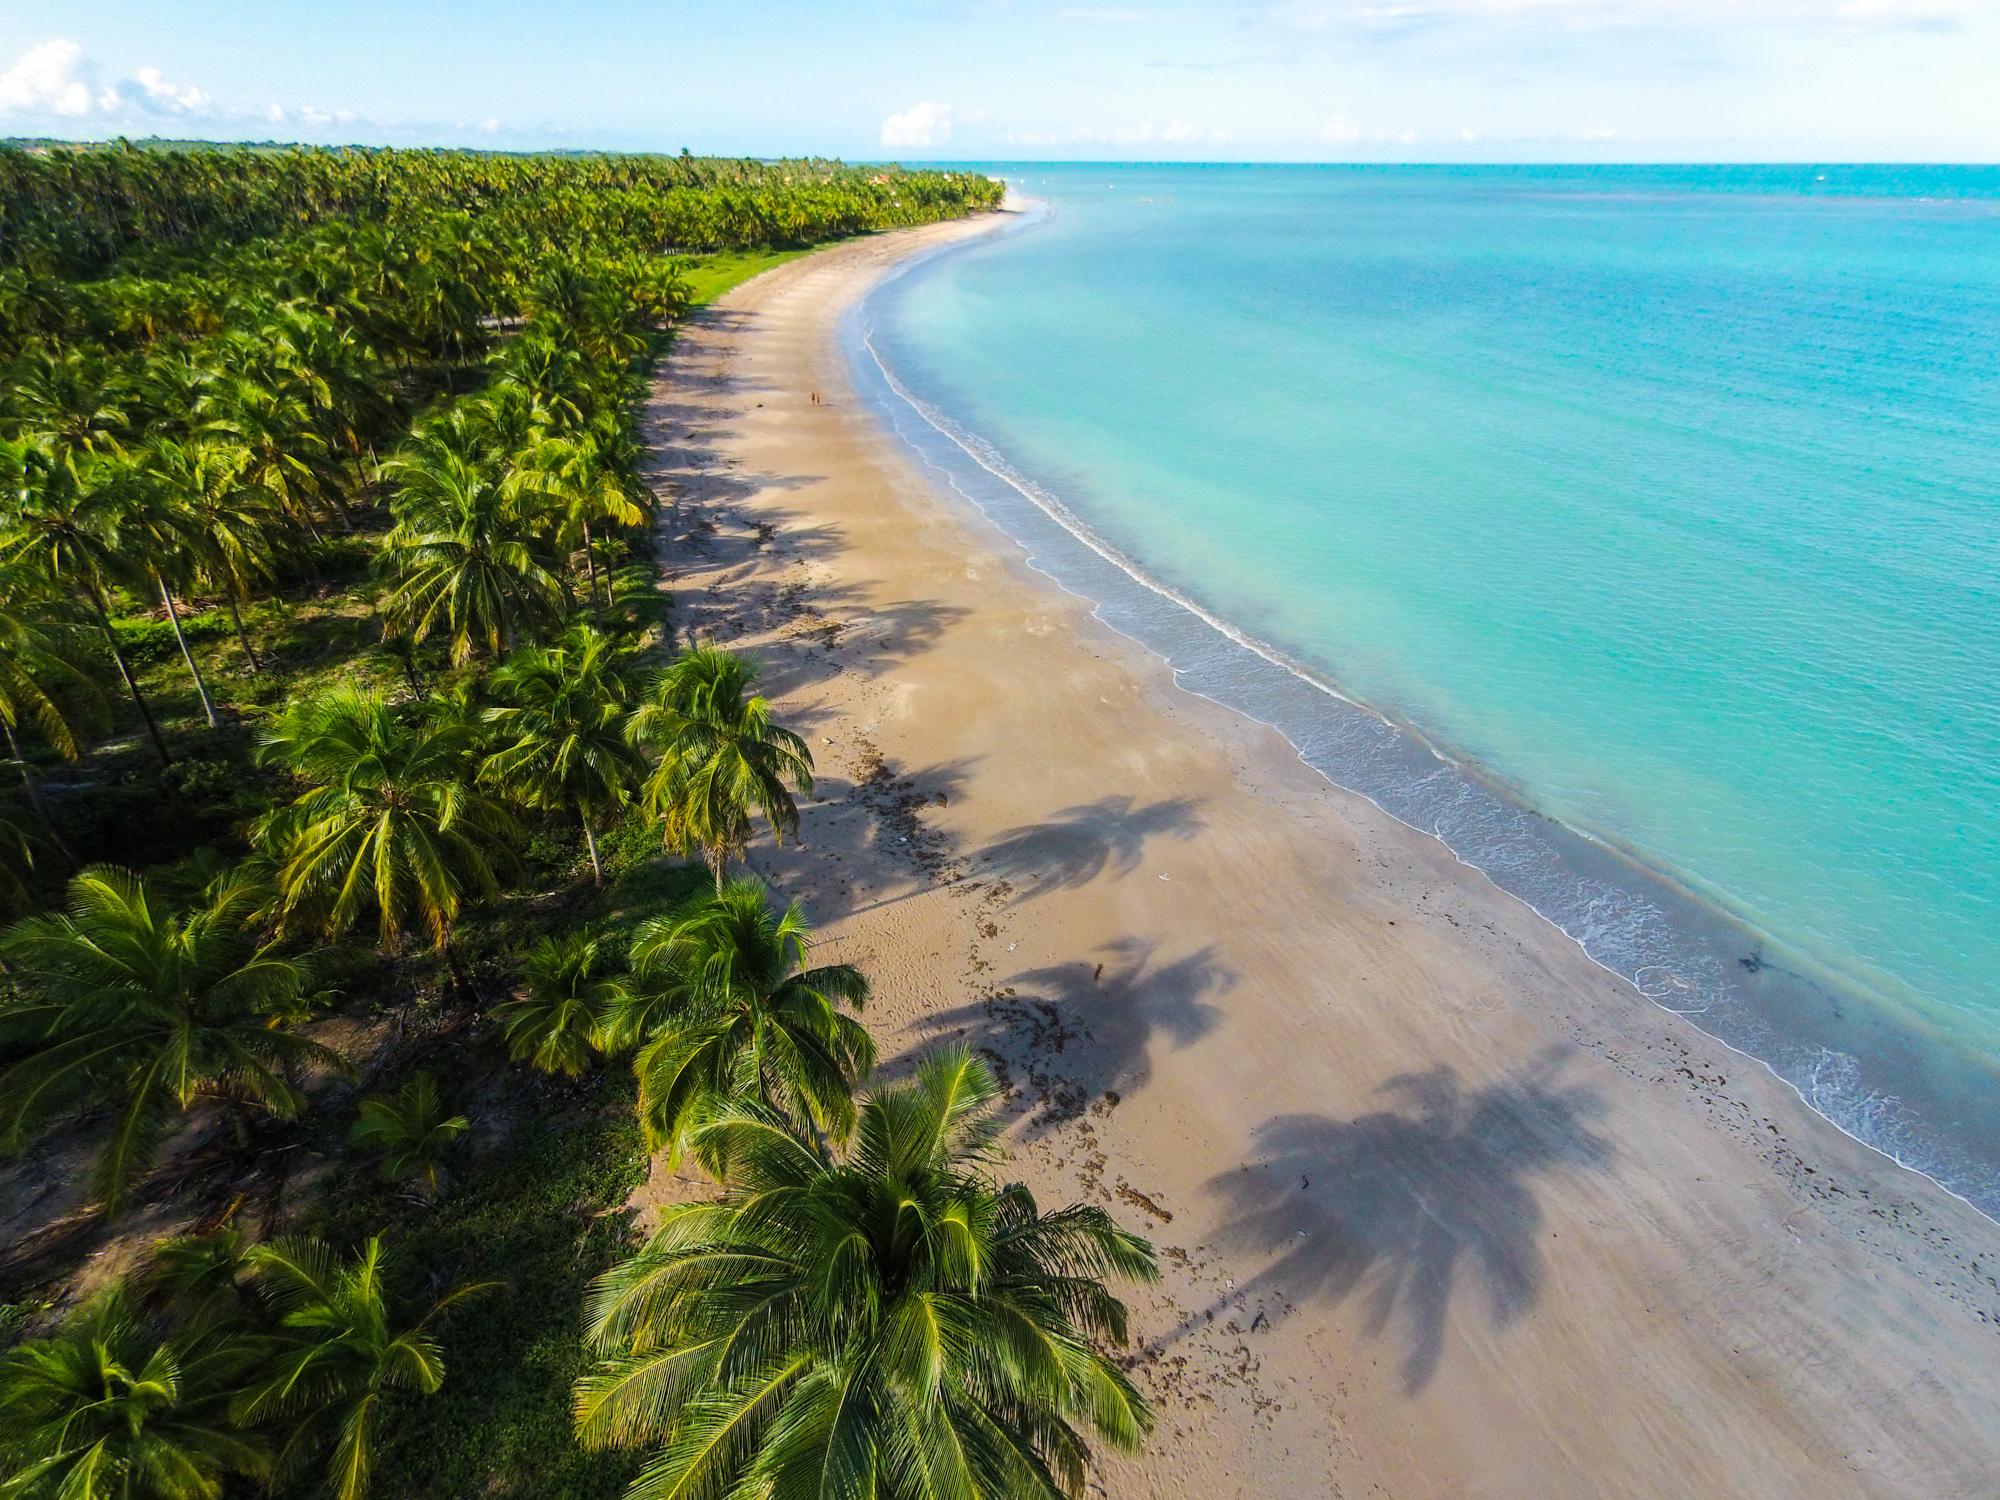 File:Praia de Ipioca-002.jpg - Wikimedia Commons